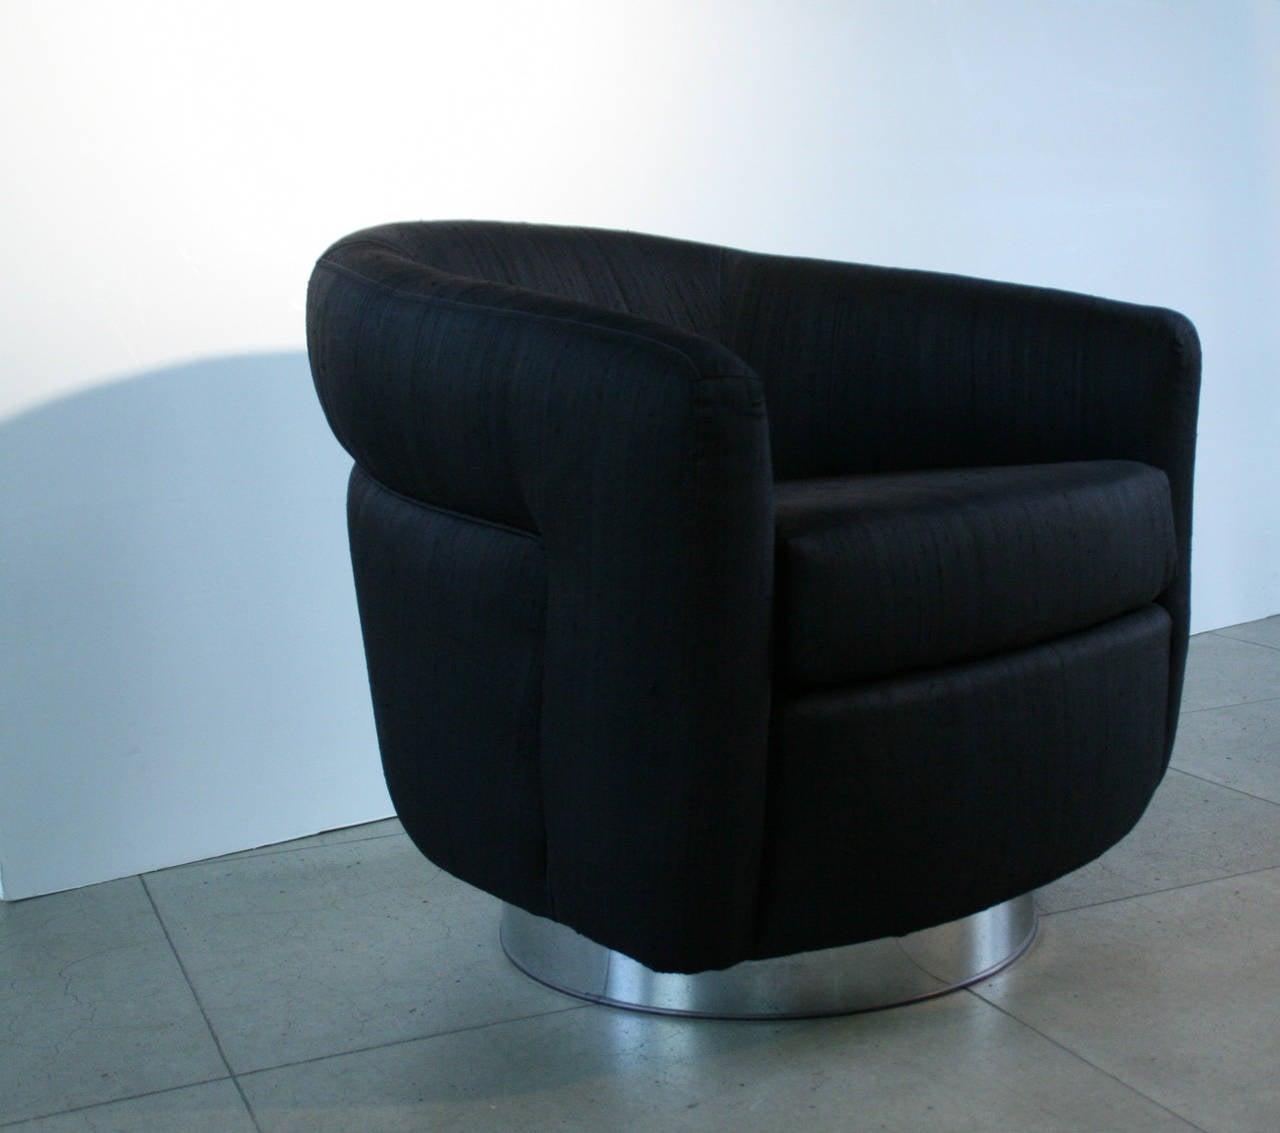 barrel chairs swivel rocker office chair herman miller pair of milo baughman black and rocking